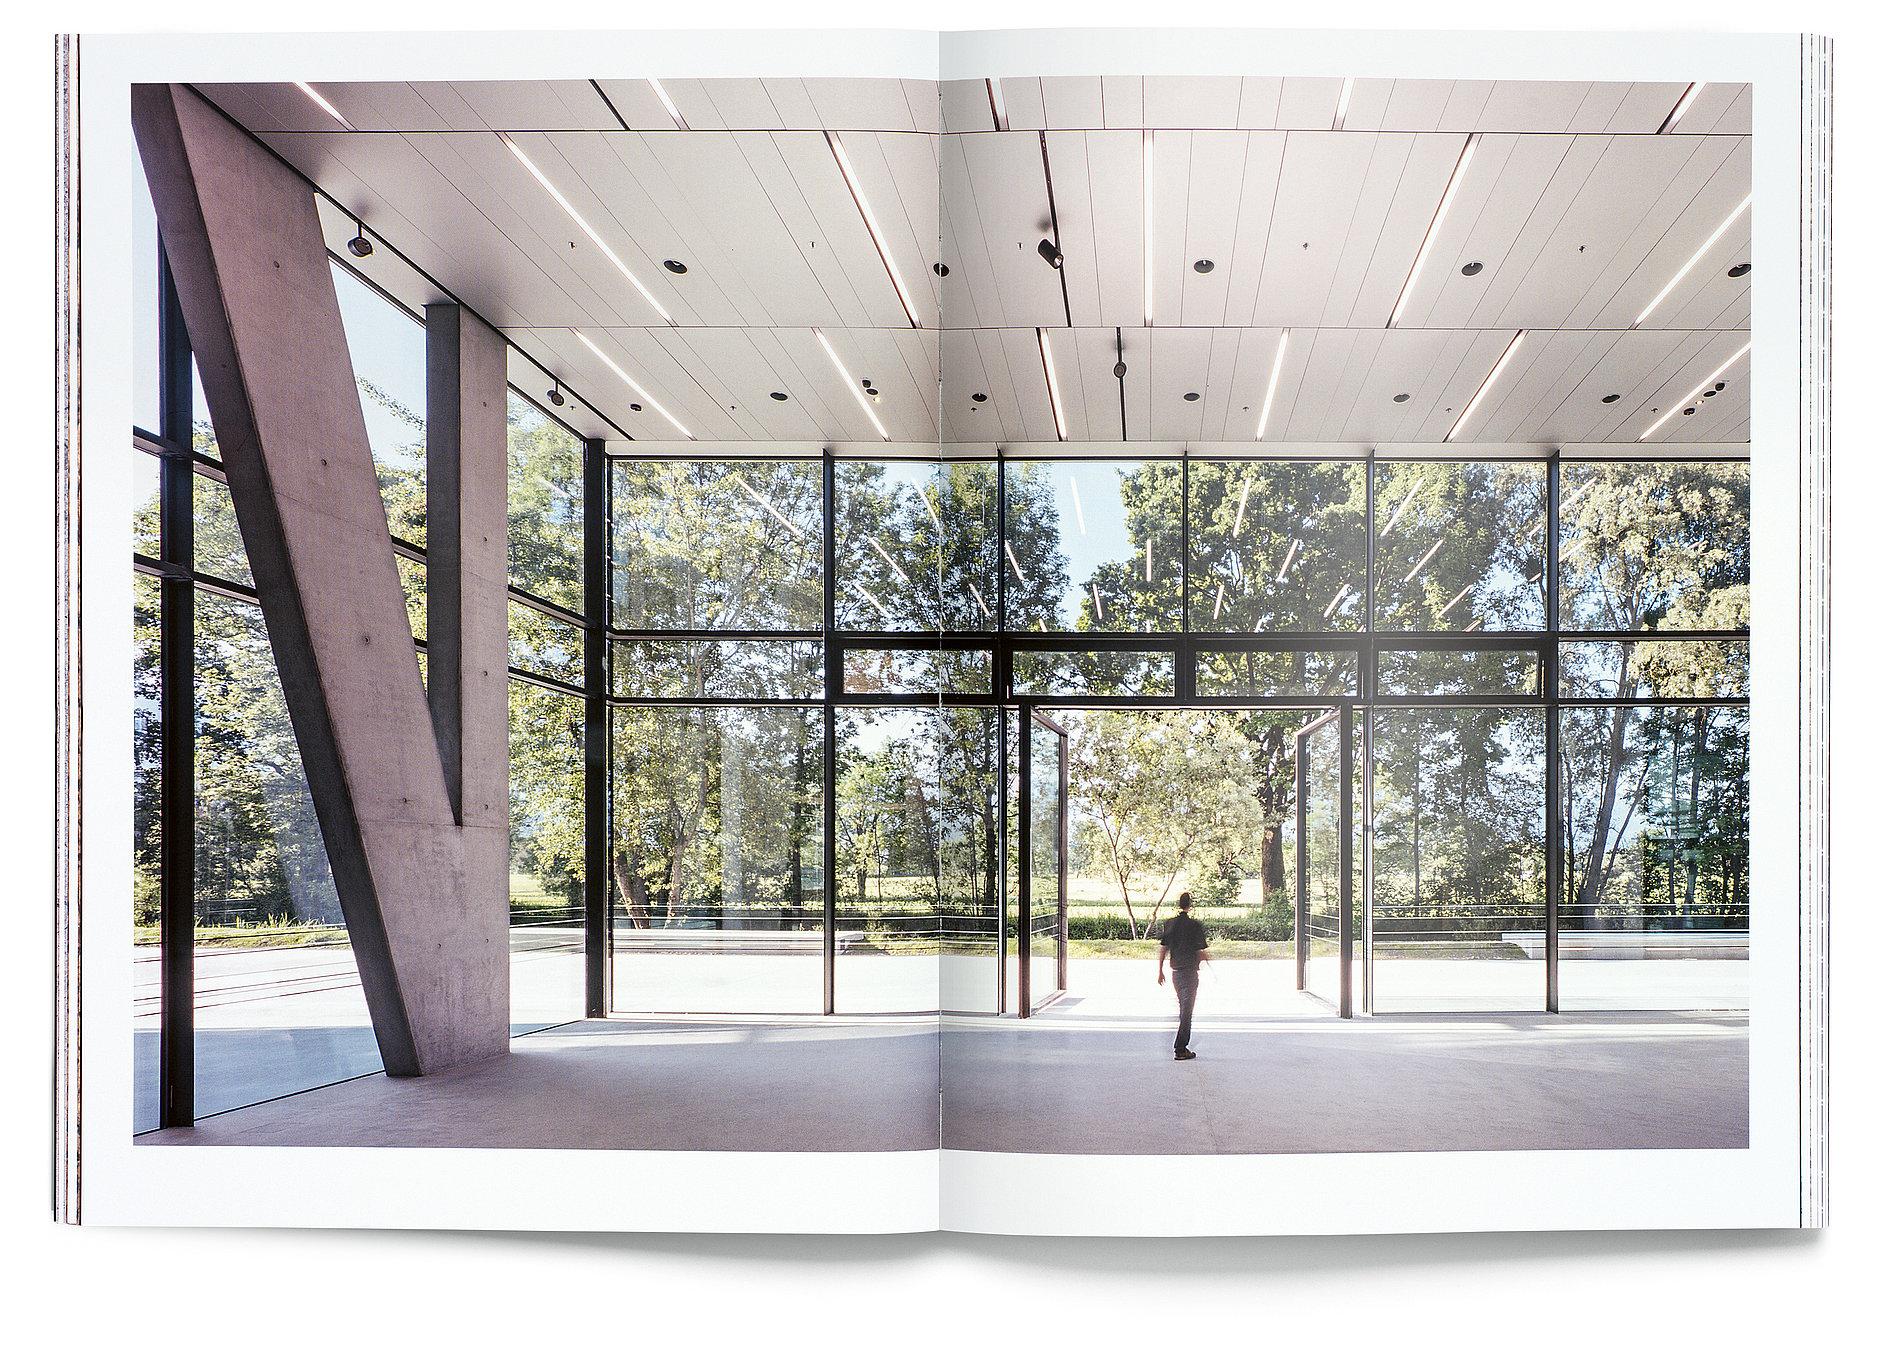 Doppelmayr AllesWirdGut Architektur – Büro Hohe Brücke | Red Dot Design Award